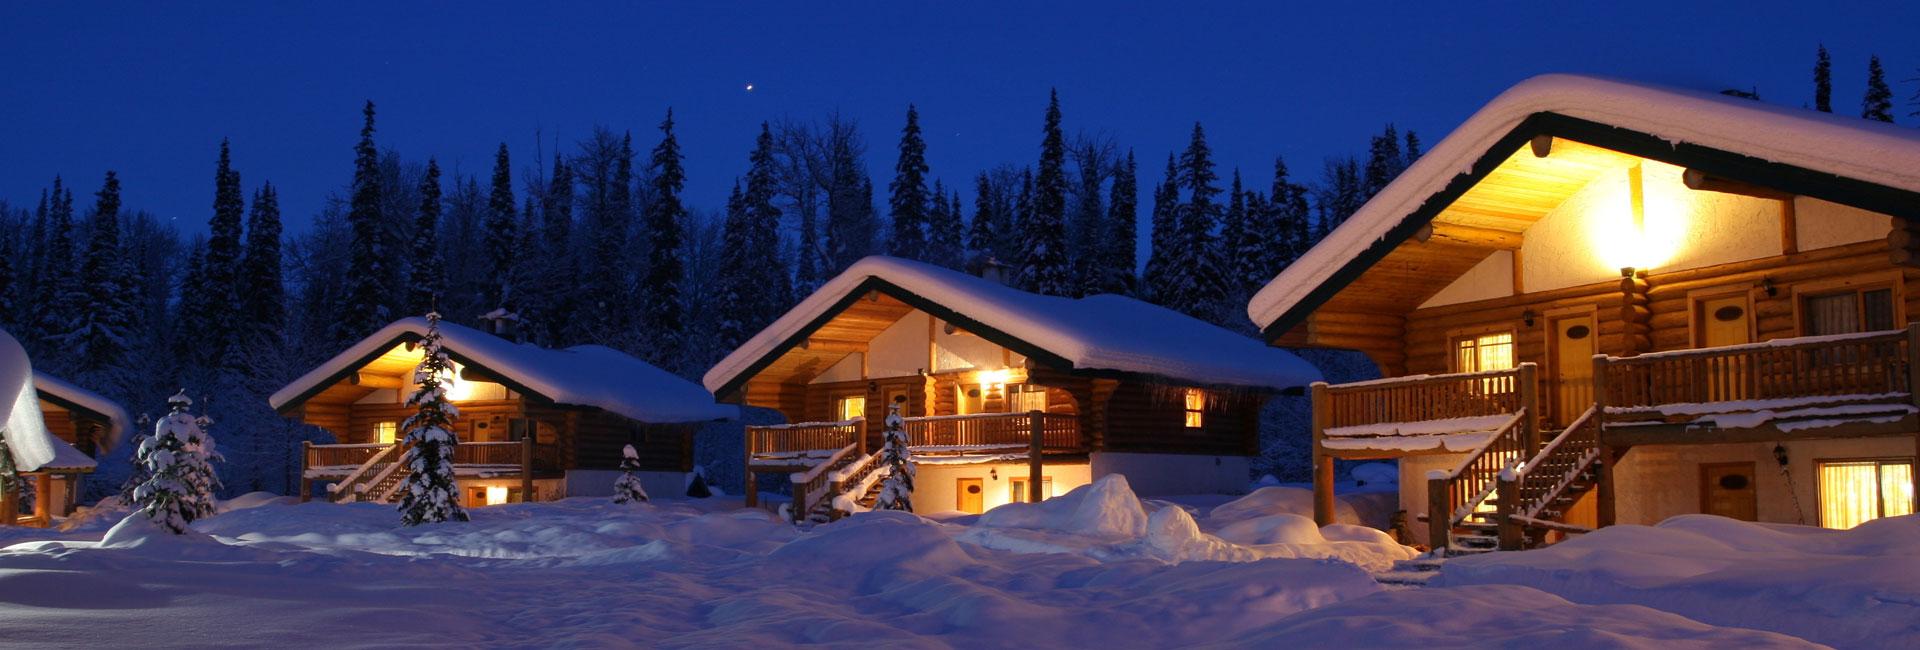 chalets-winter-urlaub